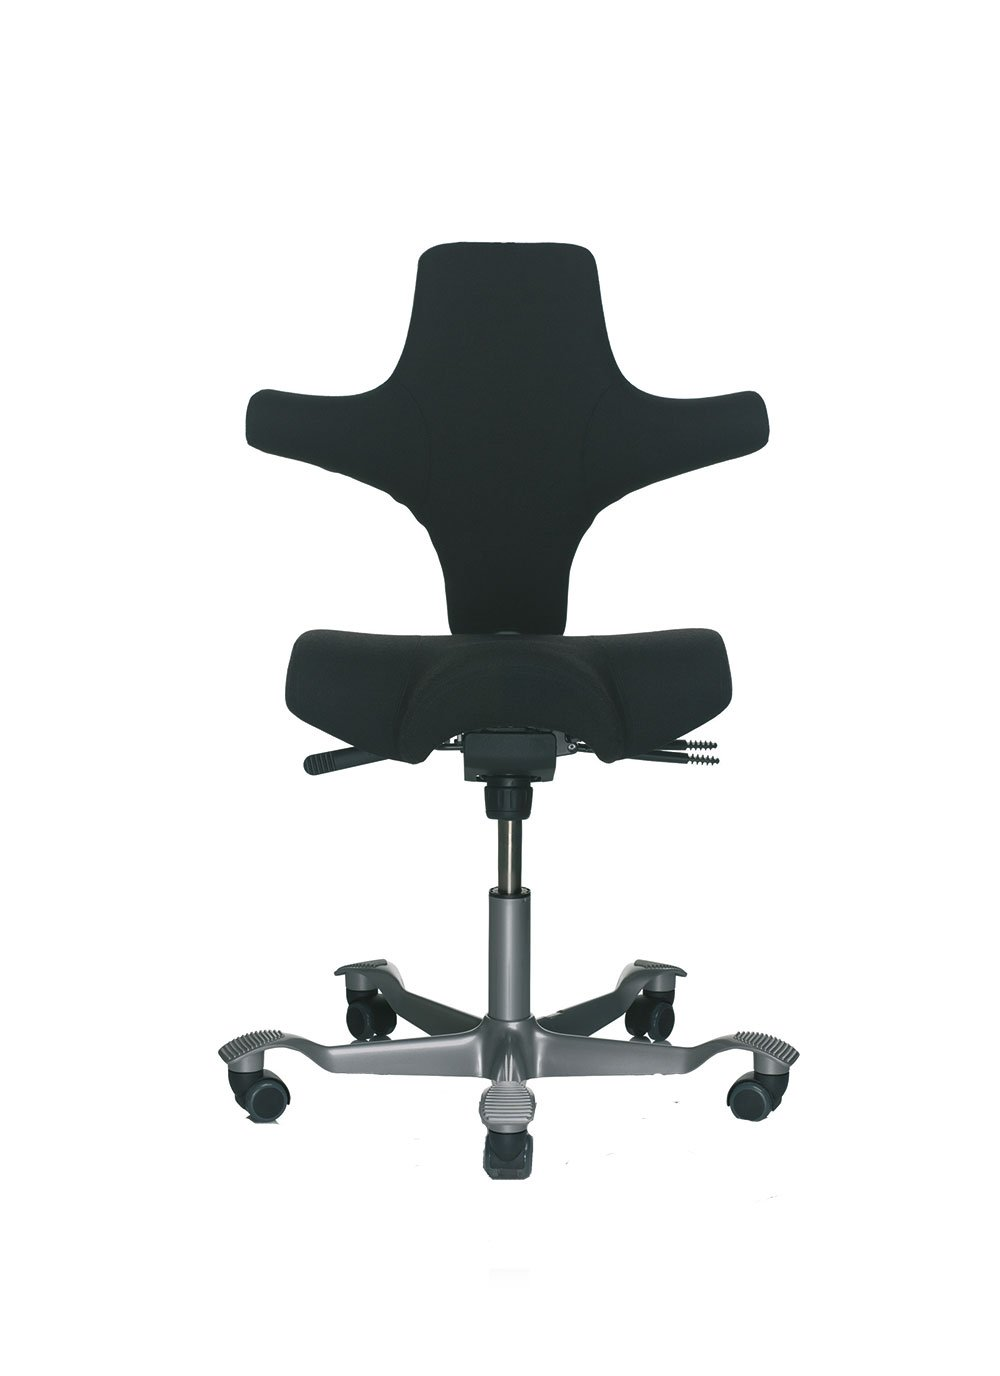 HAG Capisco Drehstuhl 8106 Bezug XTREM Havanna YS009 black Bürostuhl